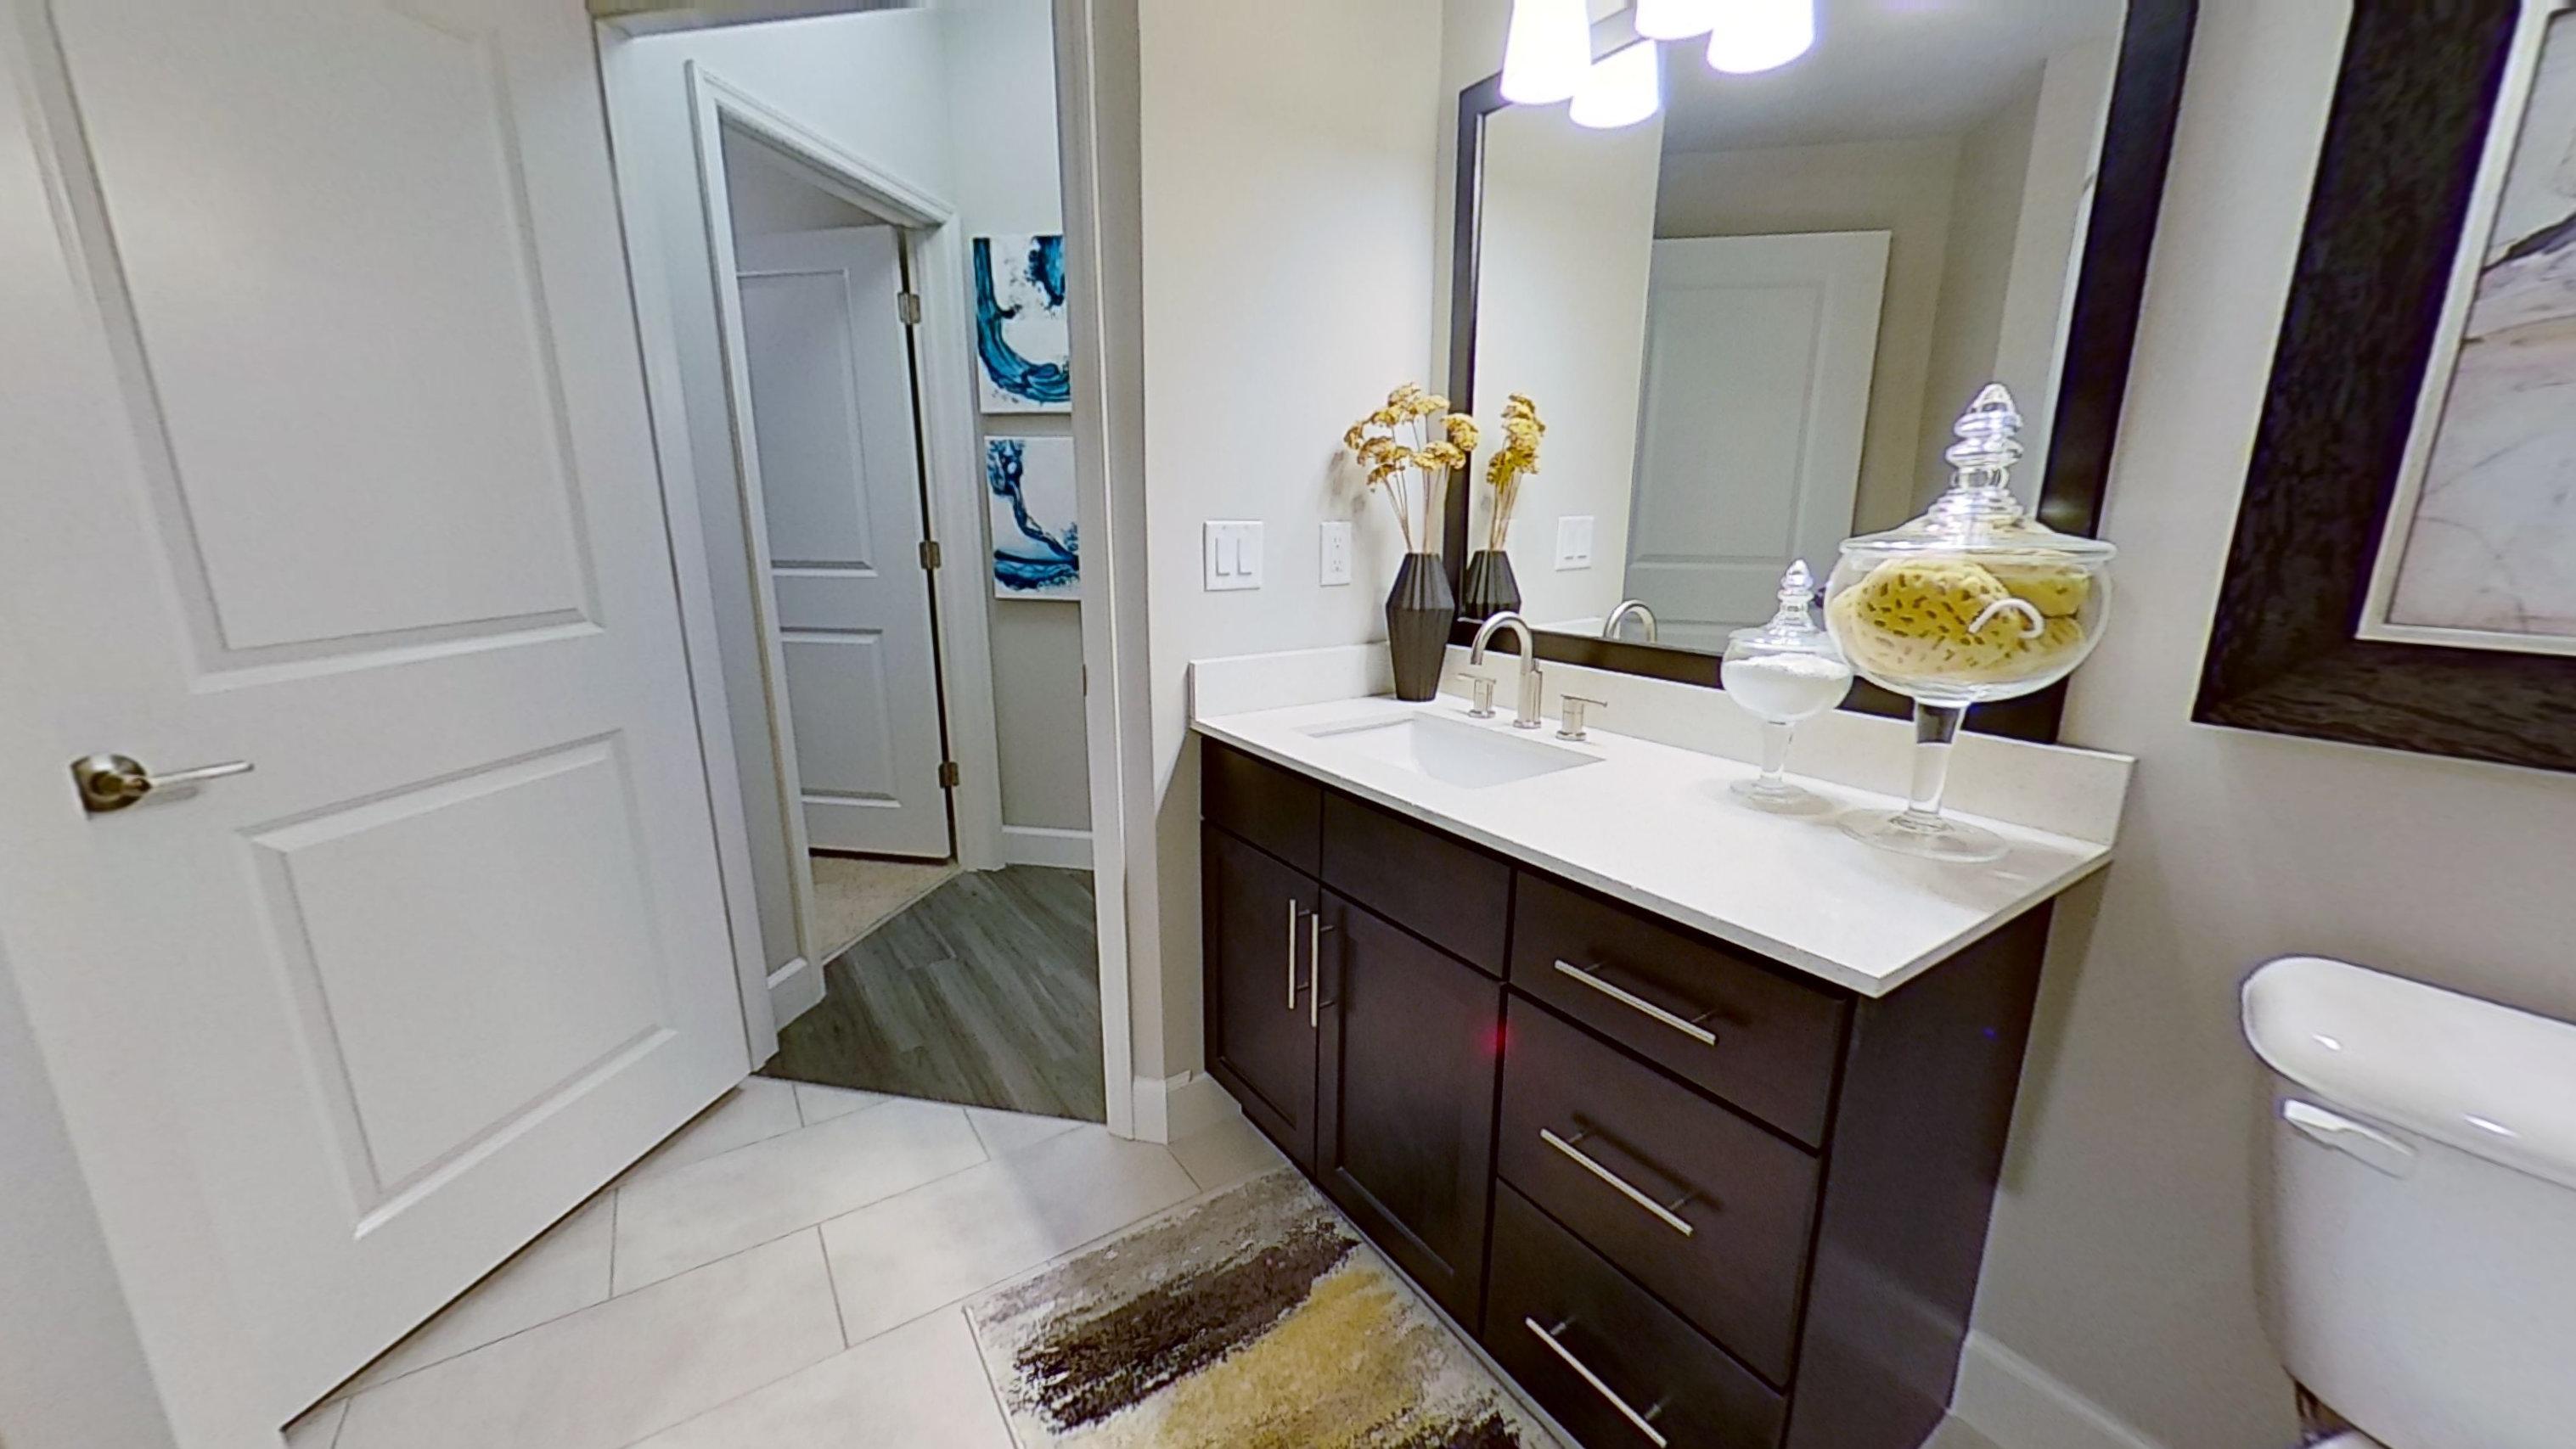 A3 Unit Bathroom at the Vue at Creve Coeur Apartments in Creve Coeur, MO